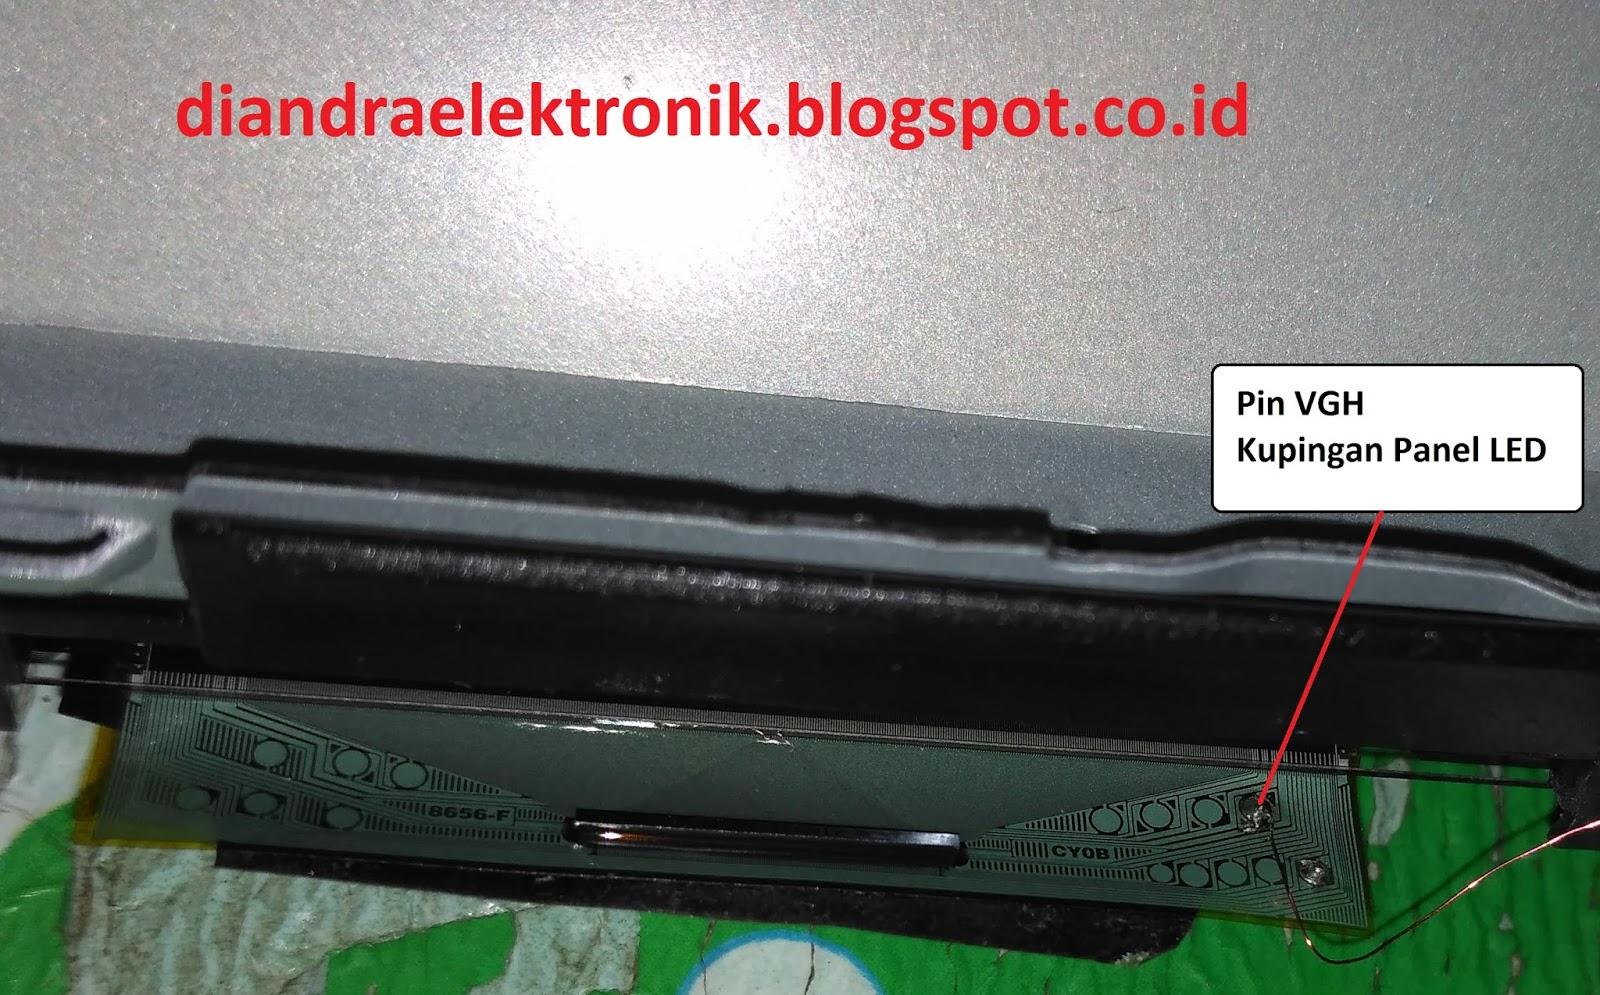 diandra elektronik: TV Led LG 32LB550A Blank Putih Kemudian Meredup